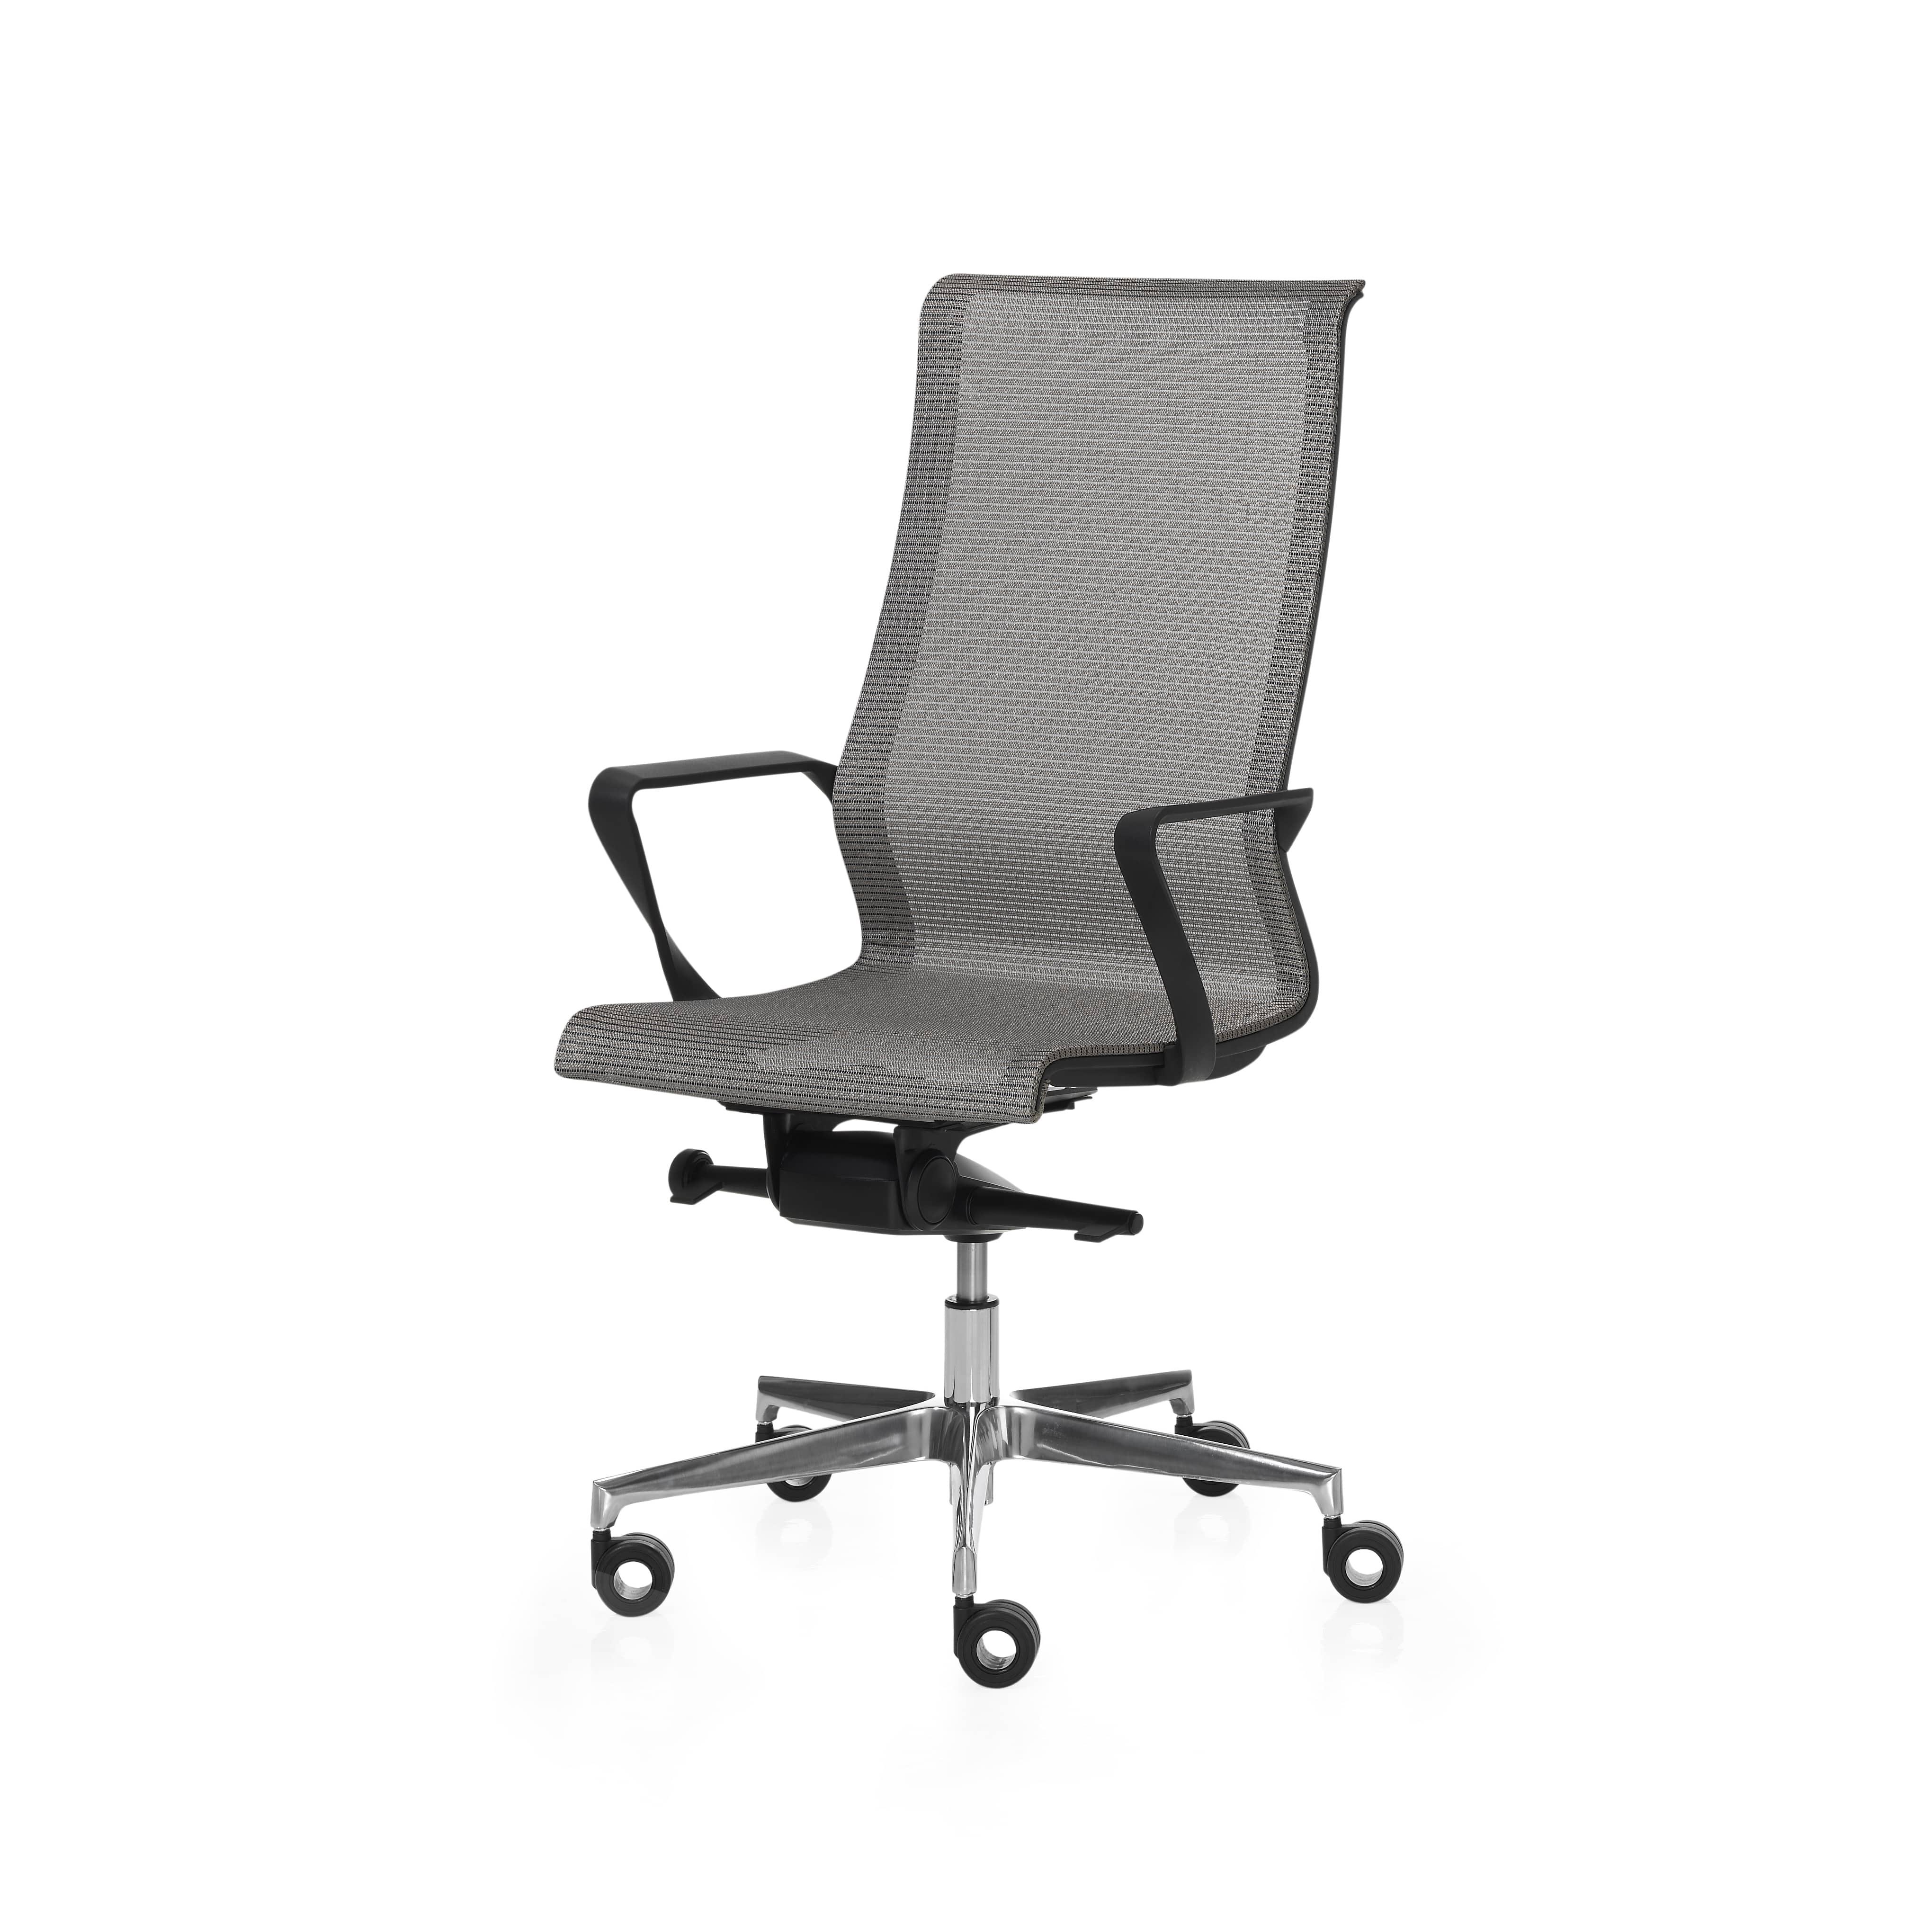 sillas-oficina-General-muebles-paco-caballero-454-5caf5d9c1c77f